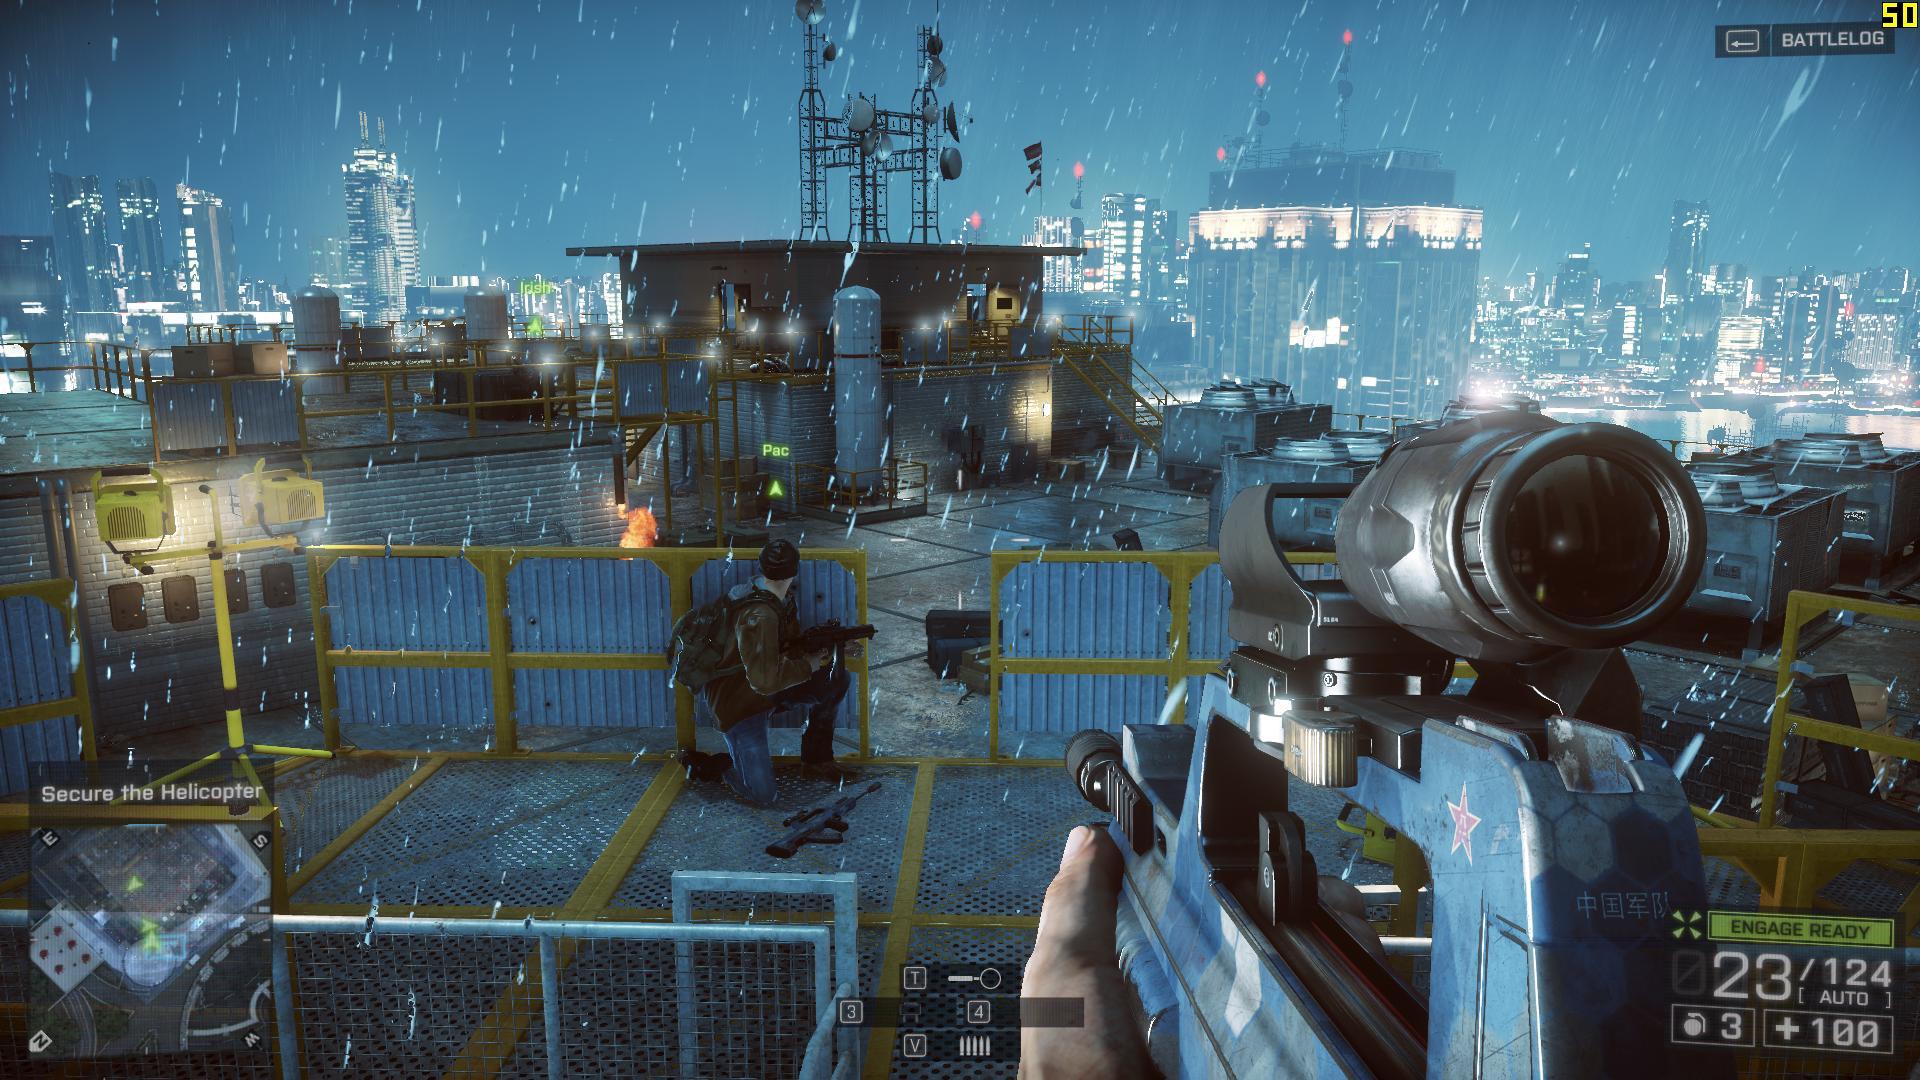 free download game battlefield 4